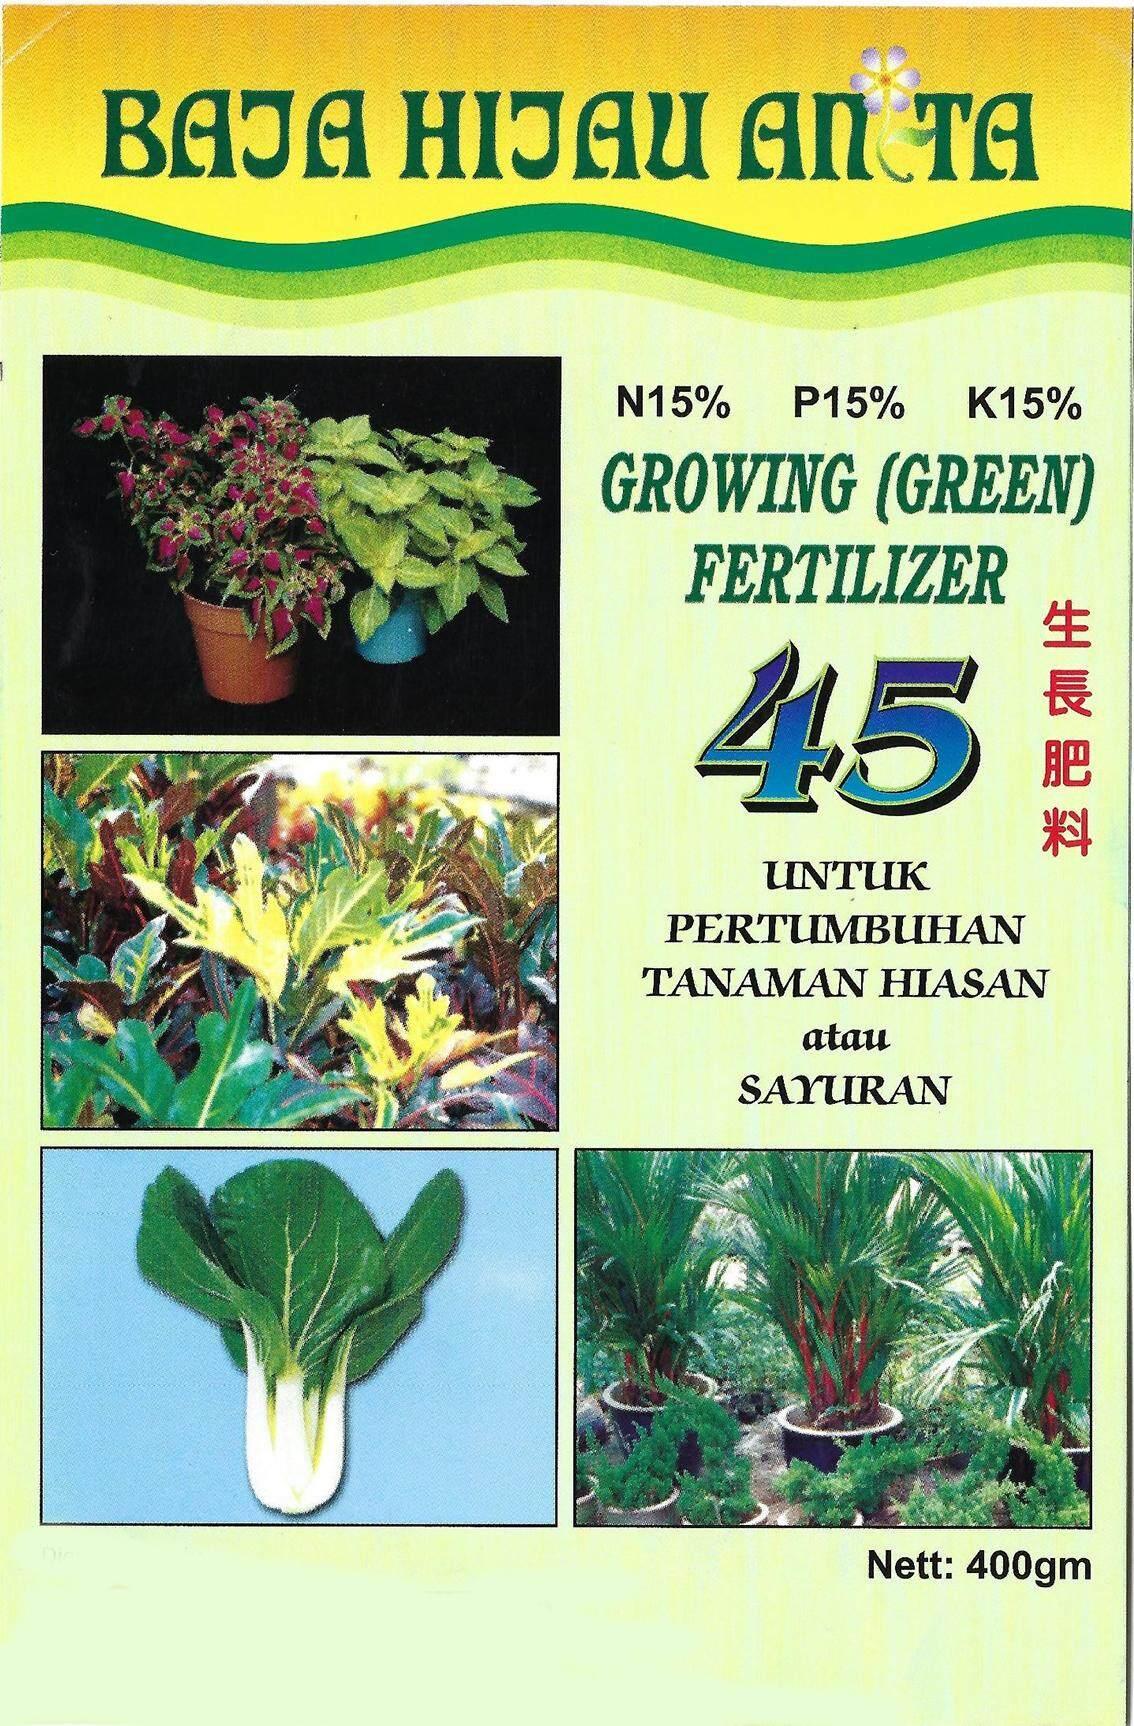 FERTILIZER - BAJA HIJAU ANITA 45 GROWING ( GREEN ) 400g